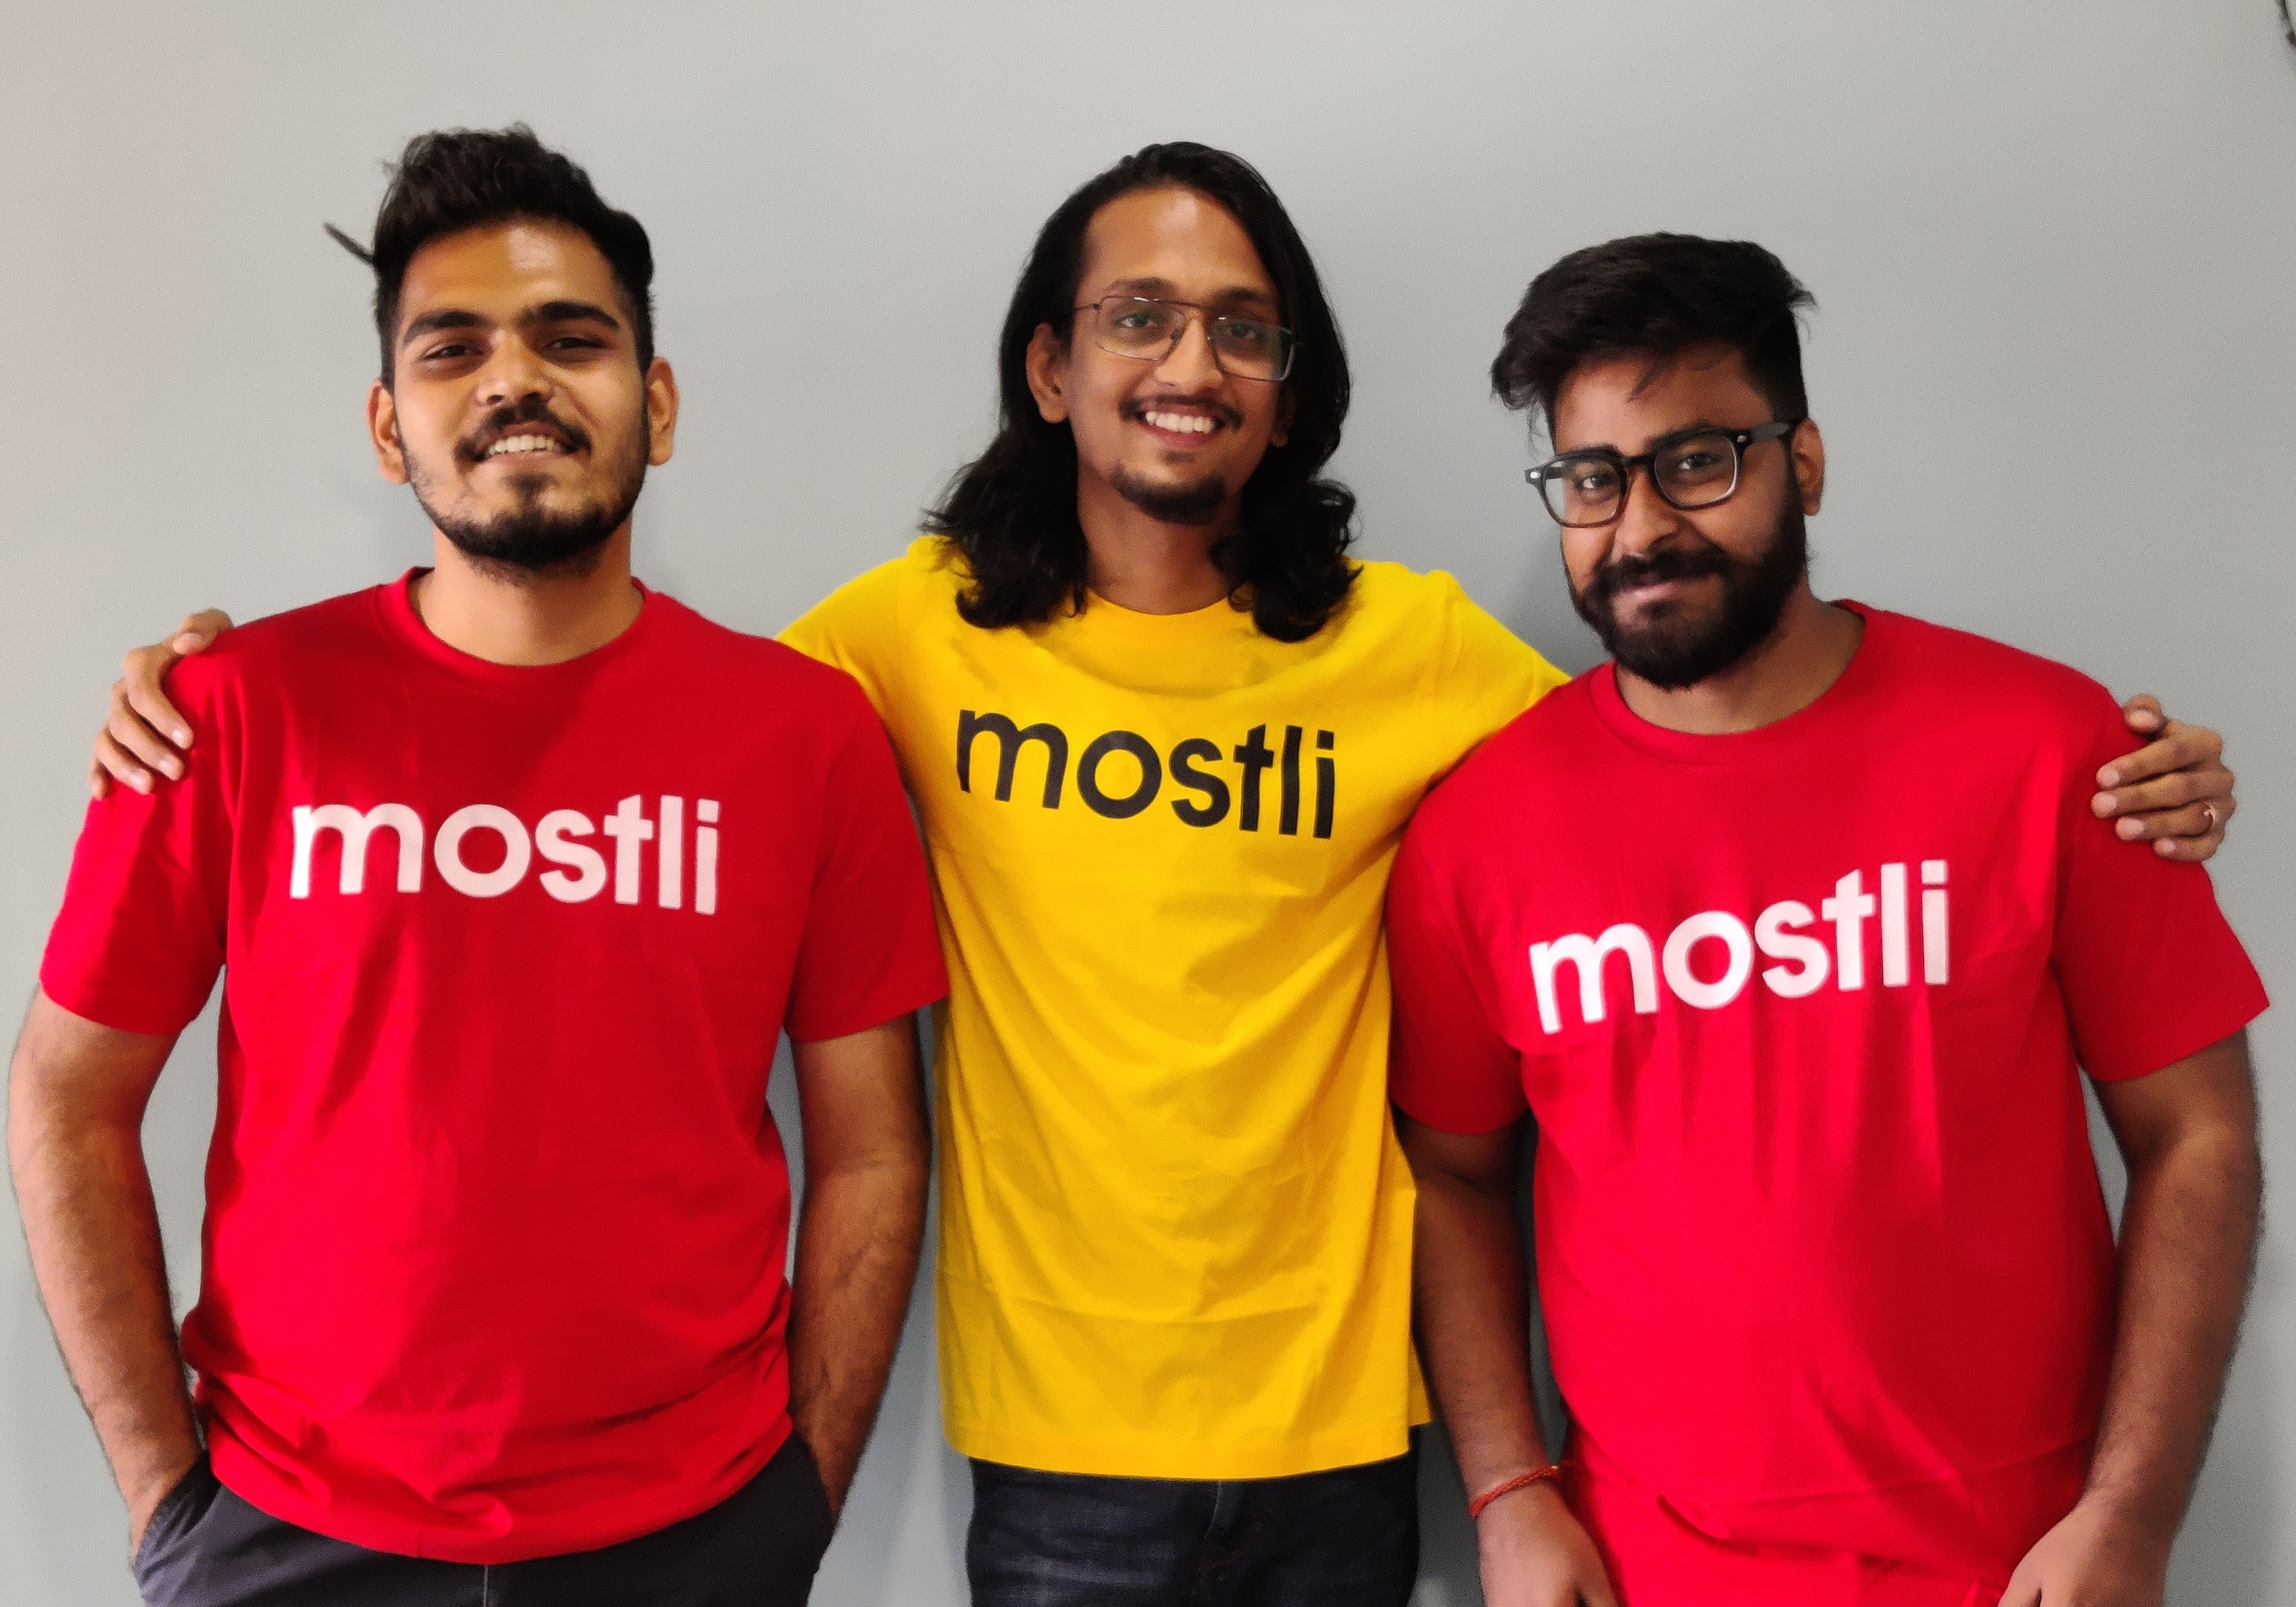 Team MOSTLI DIGITAL VENTURES LLP